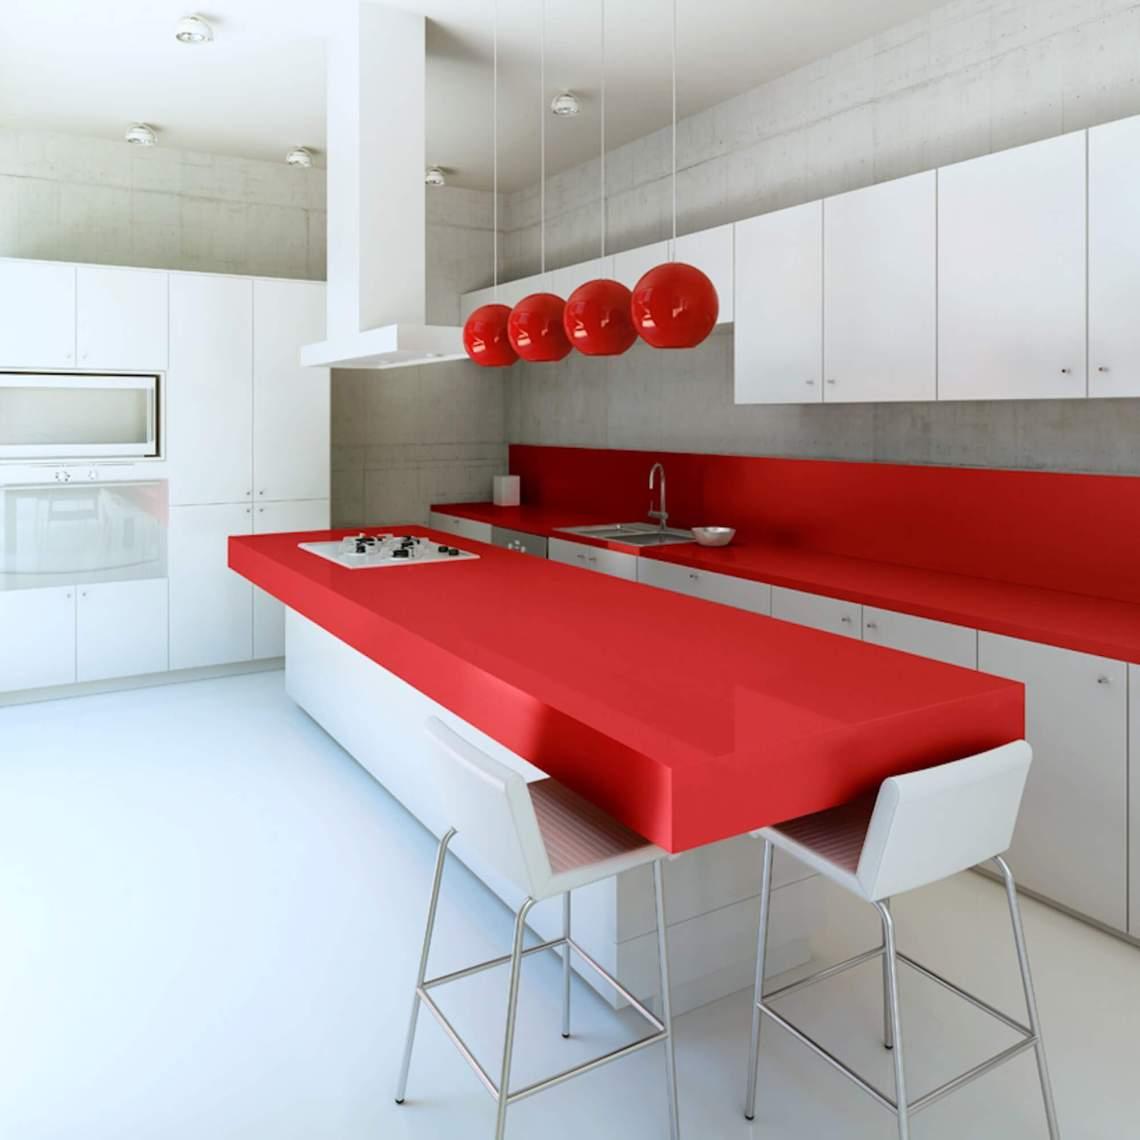 Plan de travail cuisine Quartz Silestone Rosso Monza